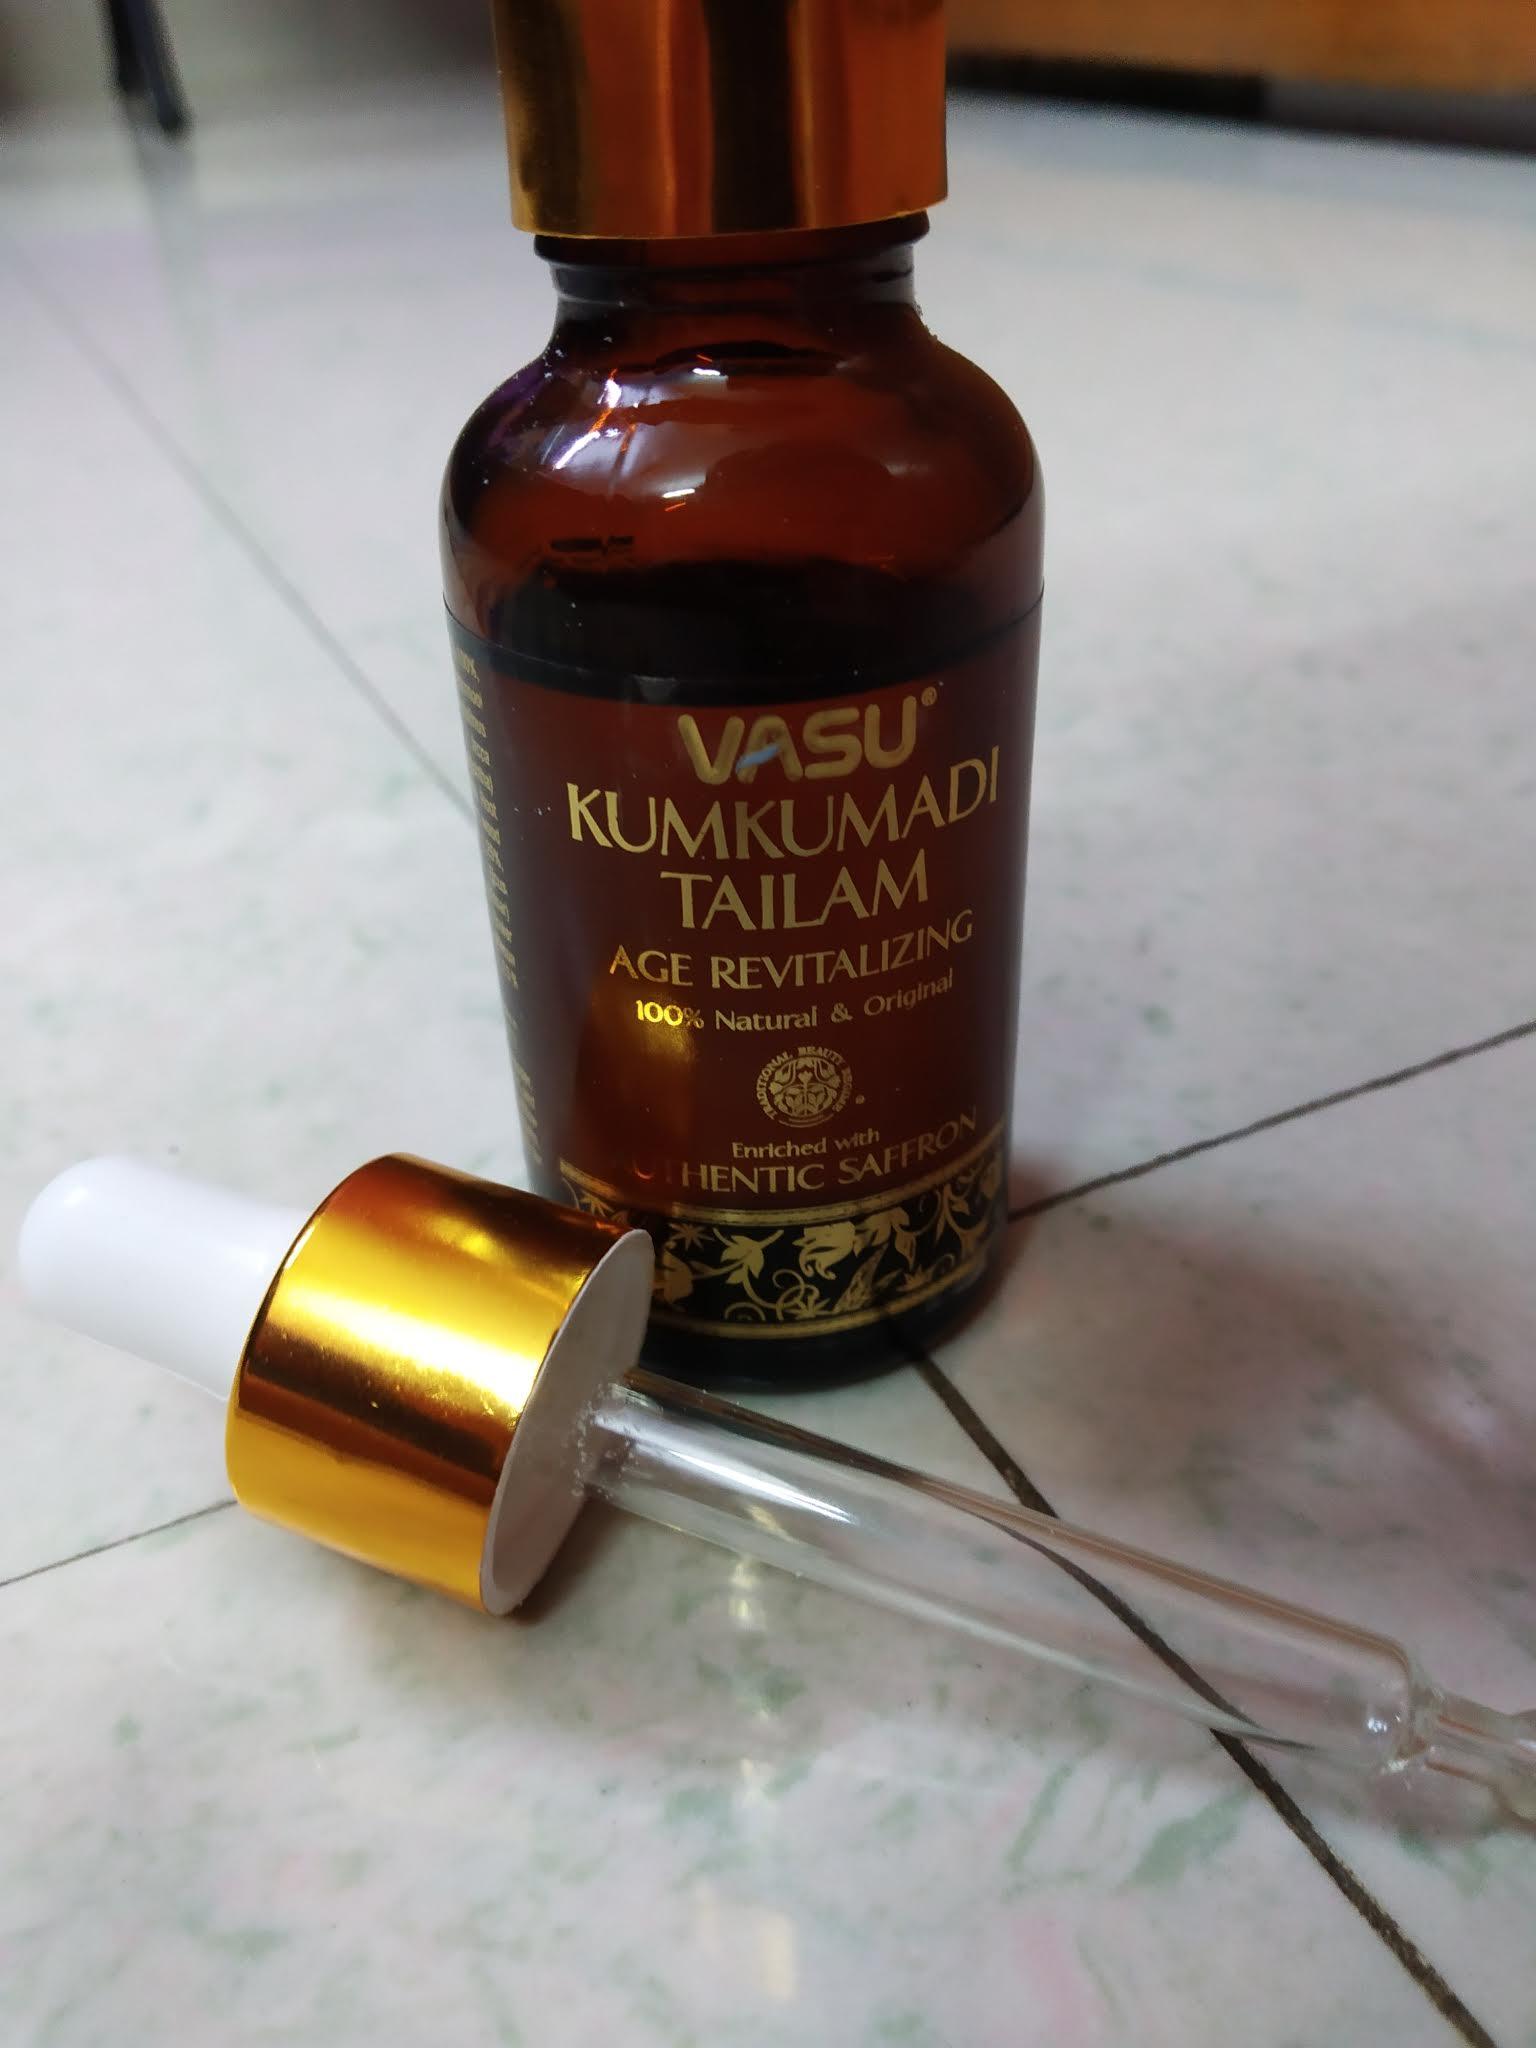 Vasu Age Revitalizing Kumkumadi Tailam-A great addition to the skin care routine-By nishthask